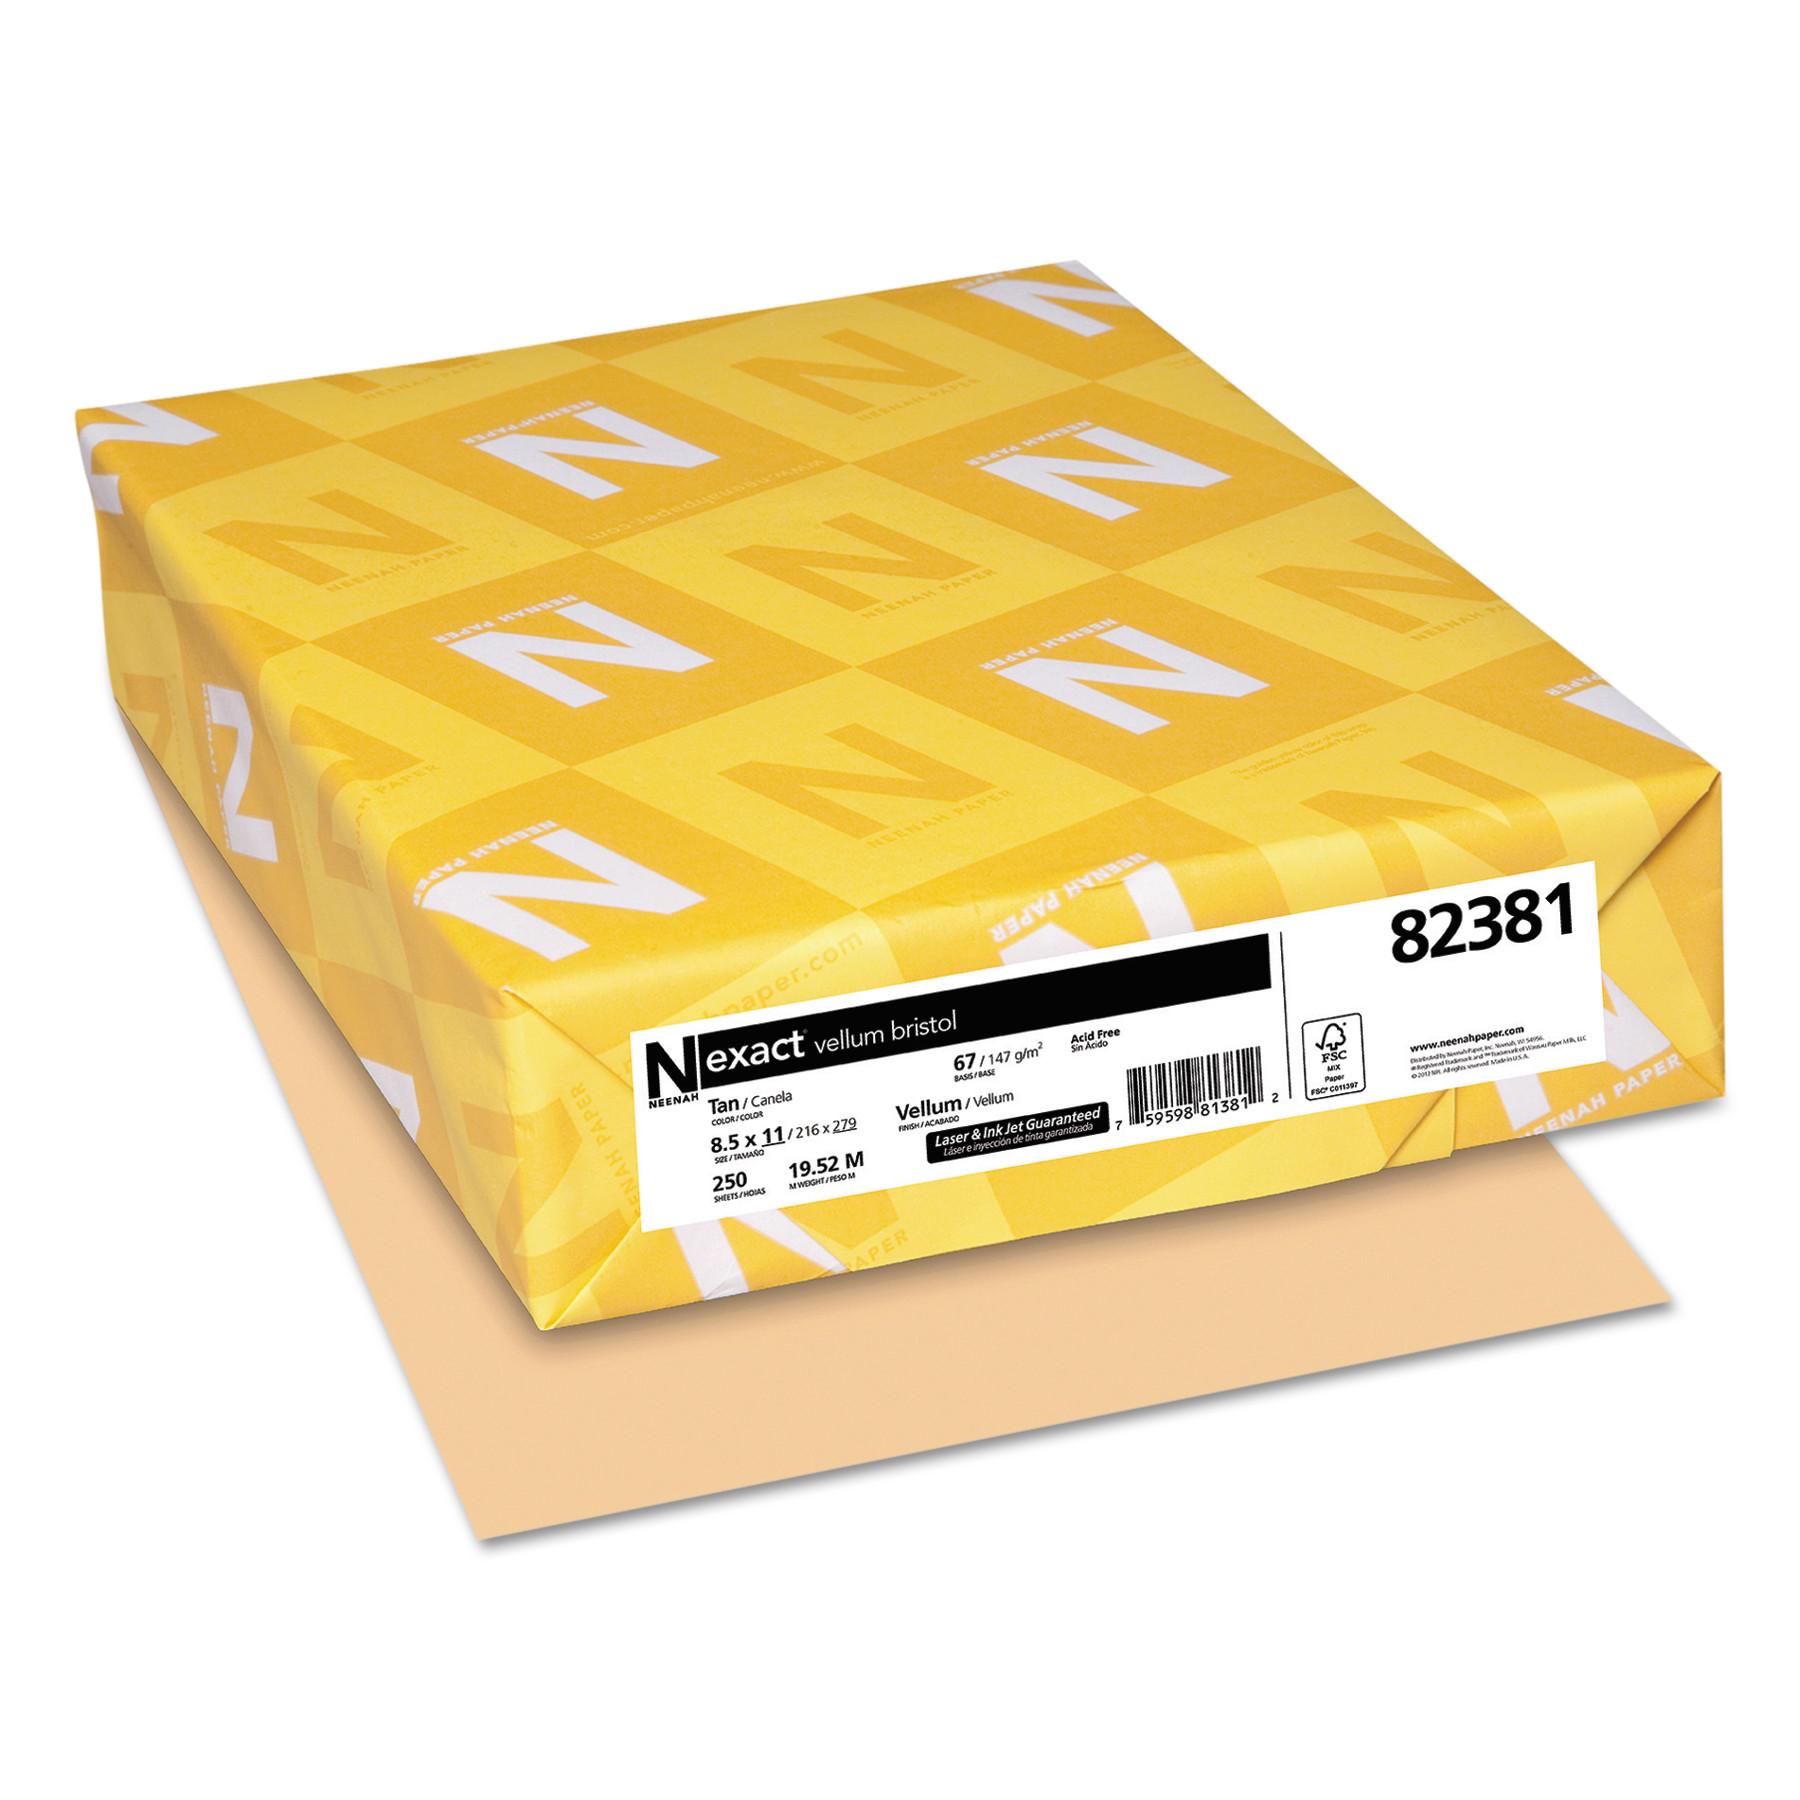 Neenah Paper Exact Vellum Bristol Cover Stock, 67lb, 8 1/2 x 11, Tan, 250 Sheets -WAU82381